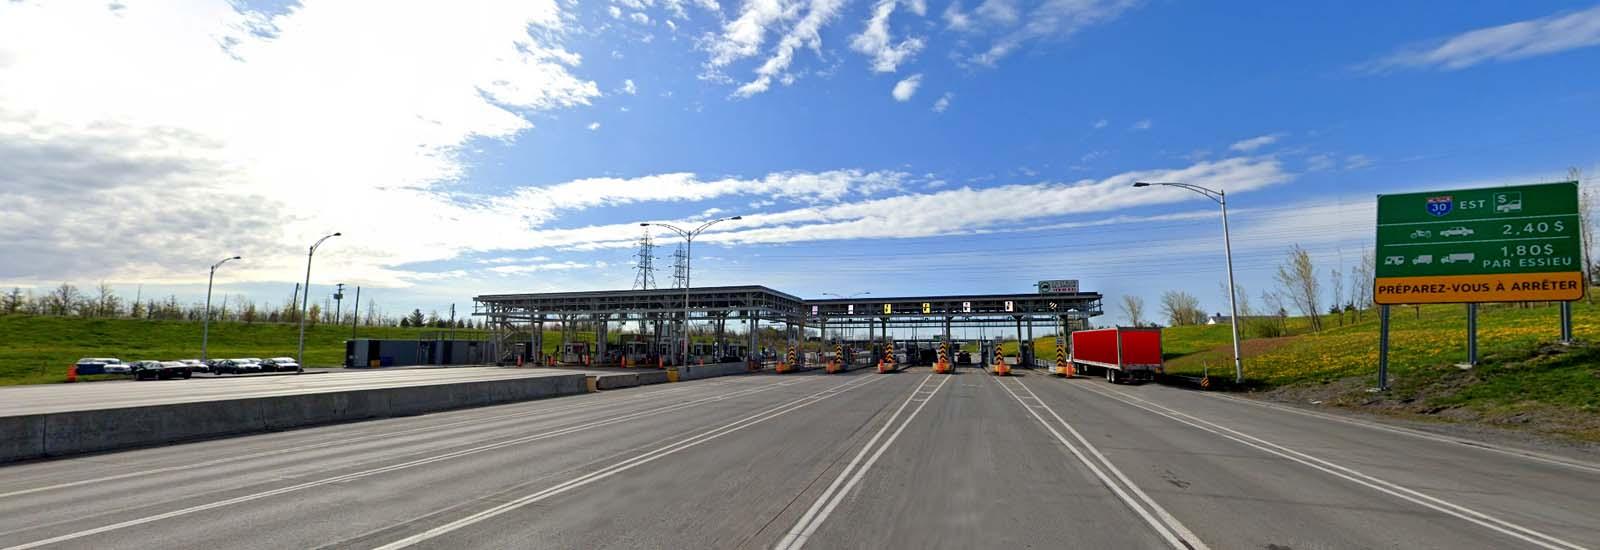 Highway 30 toll plaza-closeup